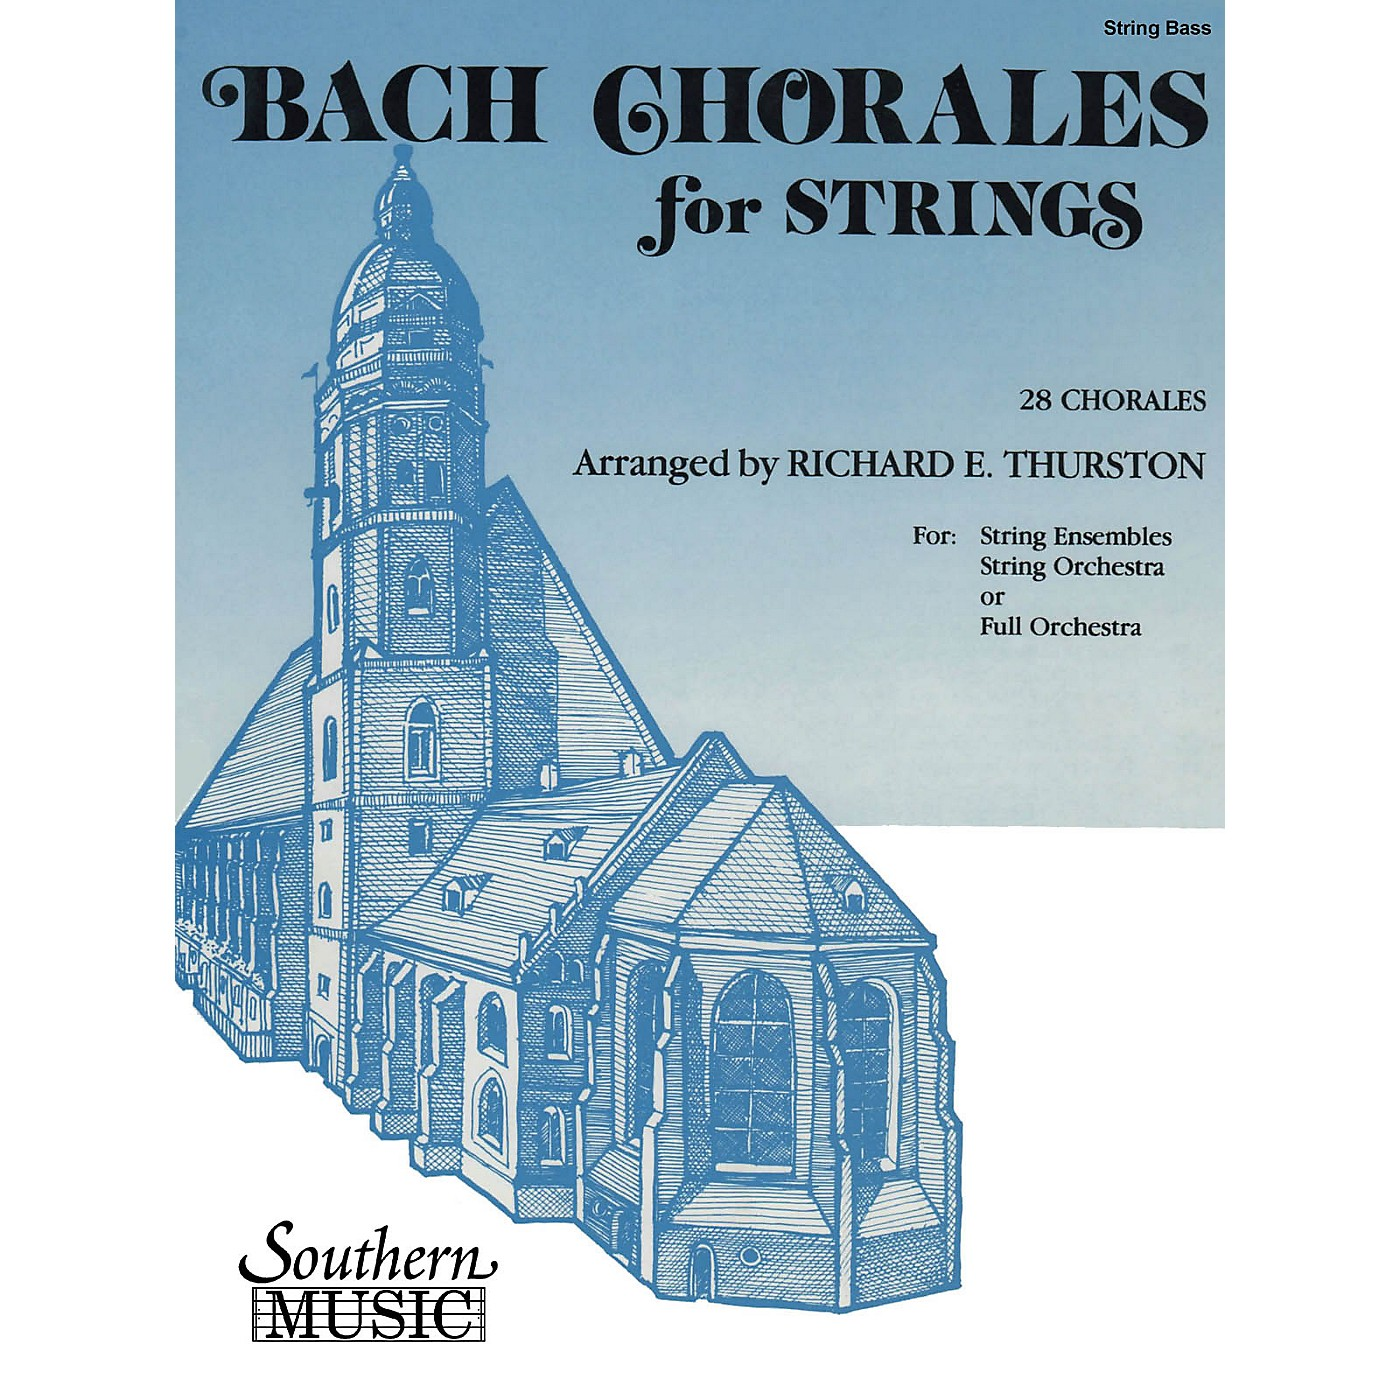 Southern Bach Chorales for Strings (28 Chorales) by Johann Sebastian Bach Arranged by Richard E. Thurston thumbnail